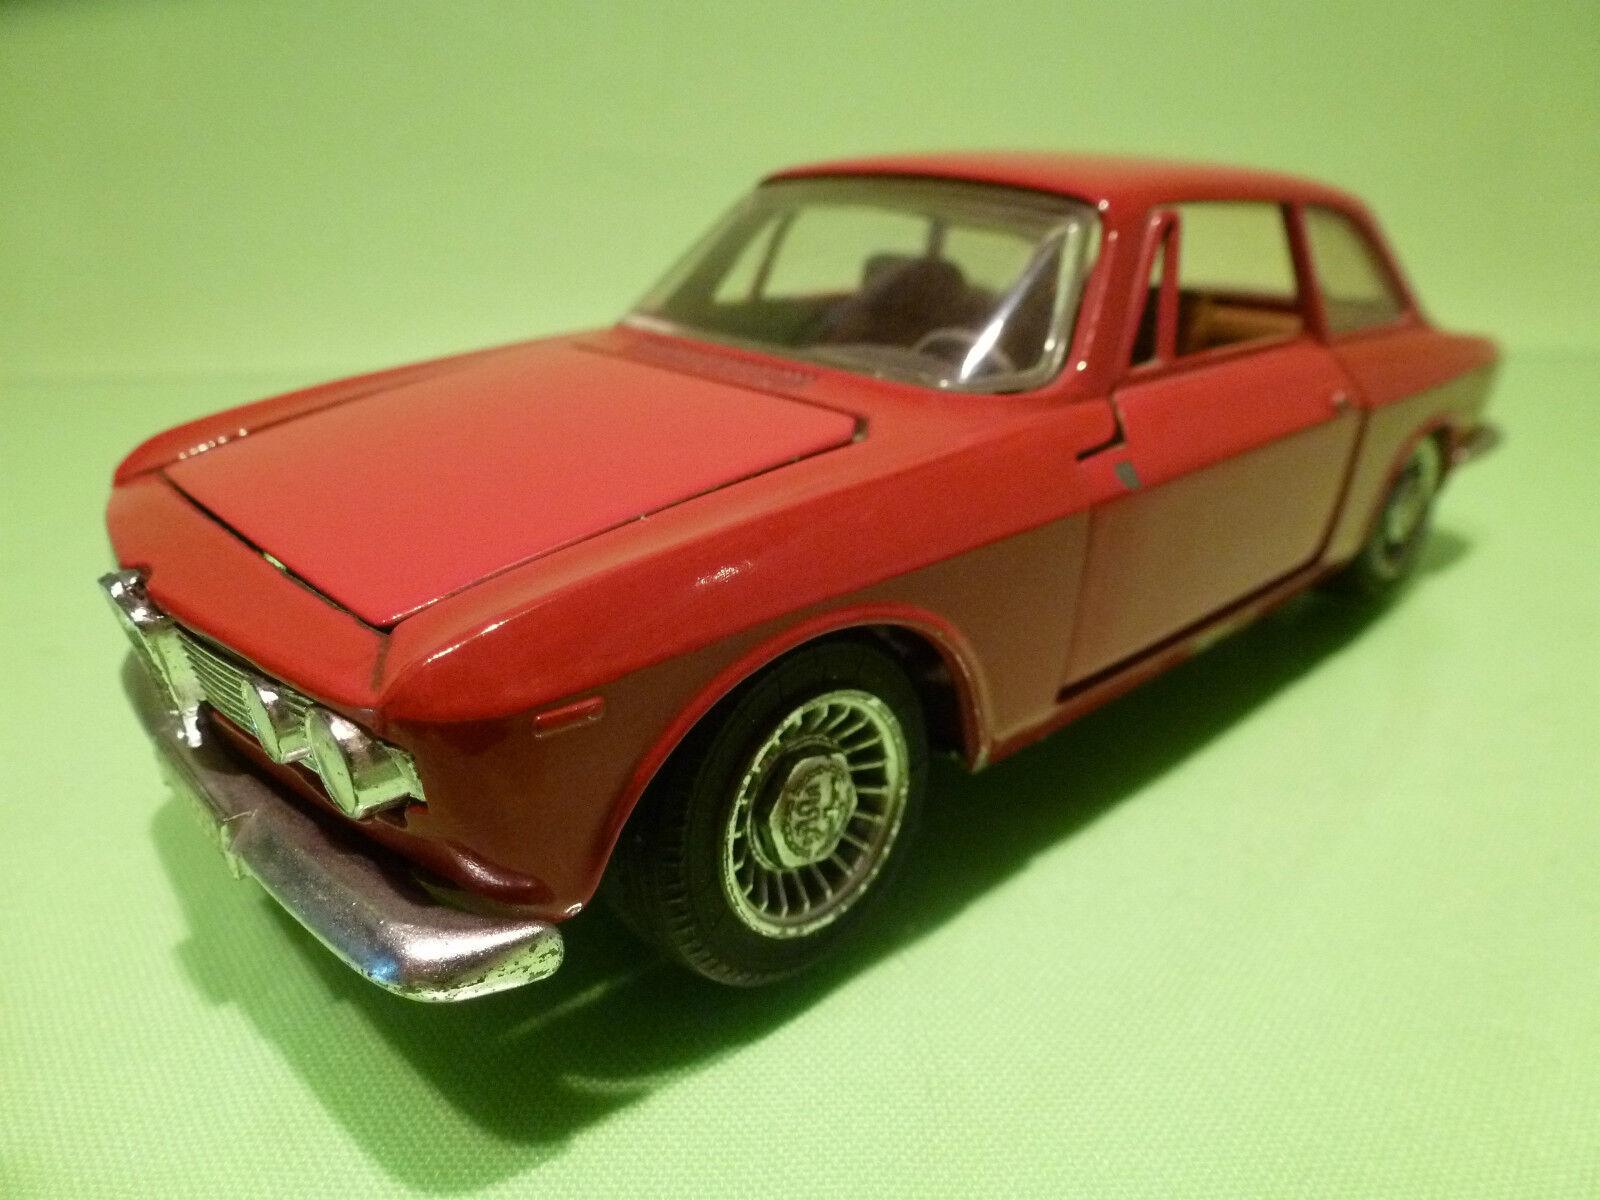 TOGI  1 23  ALFA ROMEO GIULIA GT  1750  -  ITALY 8 65   - FIRST EDITION.